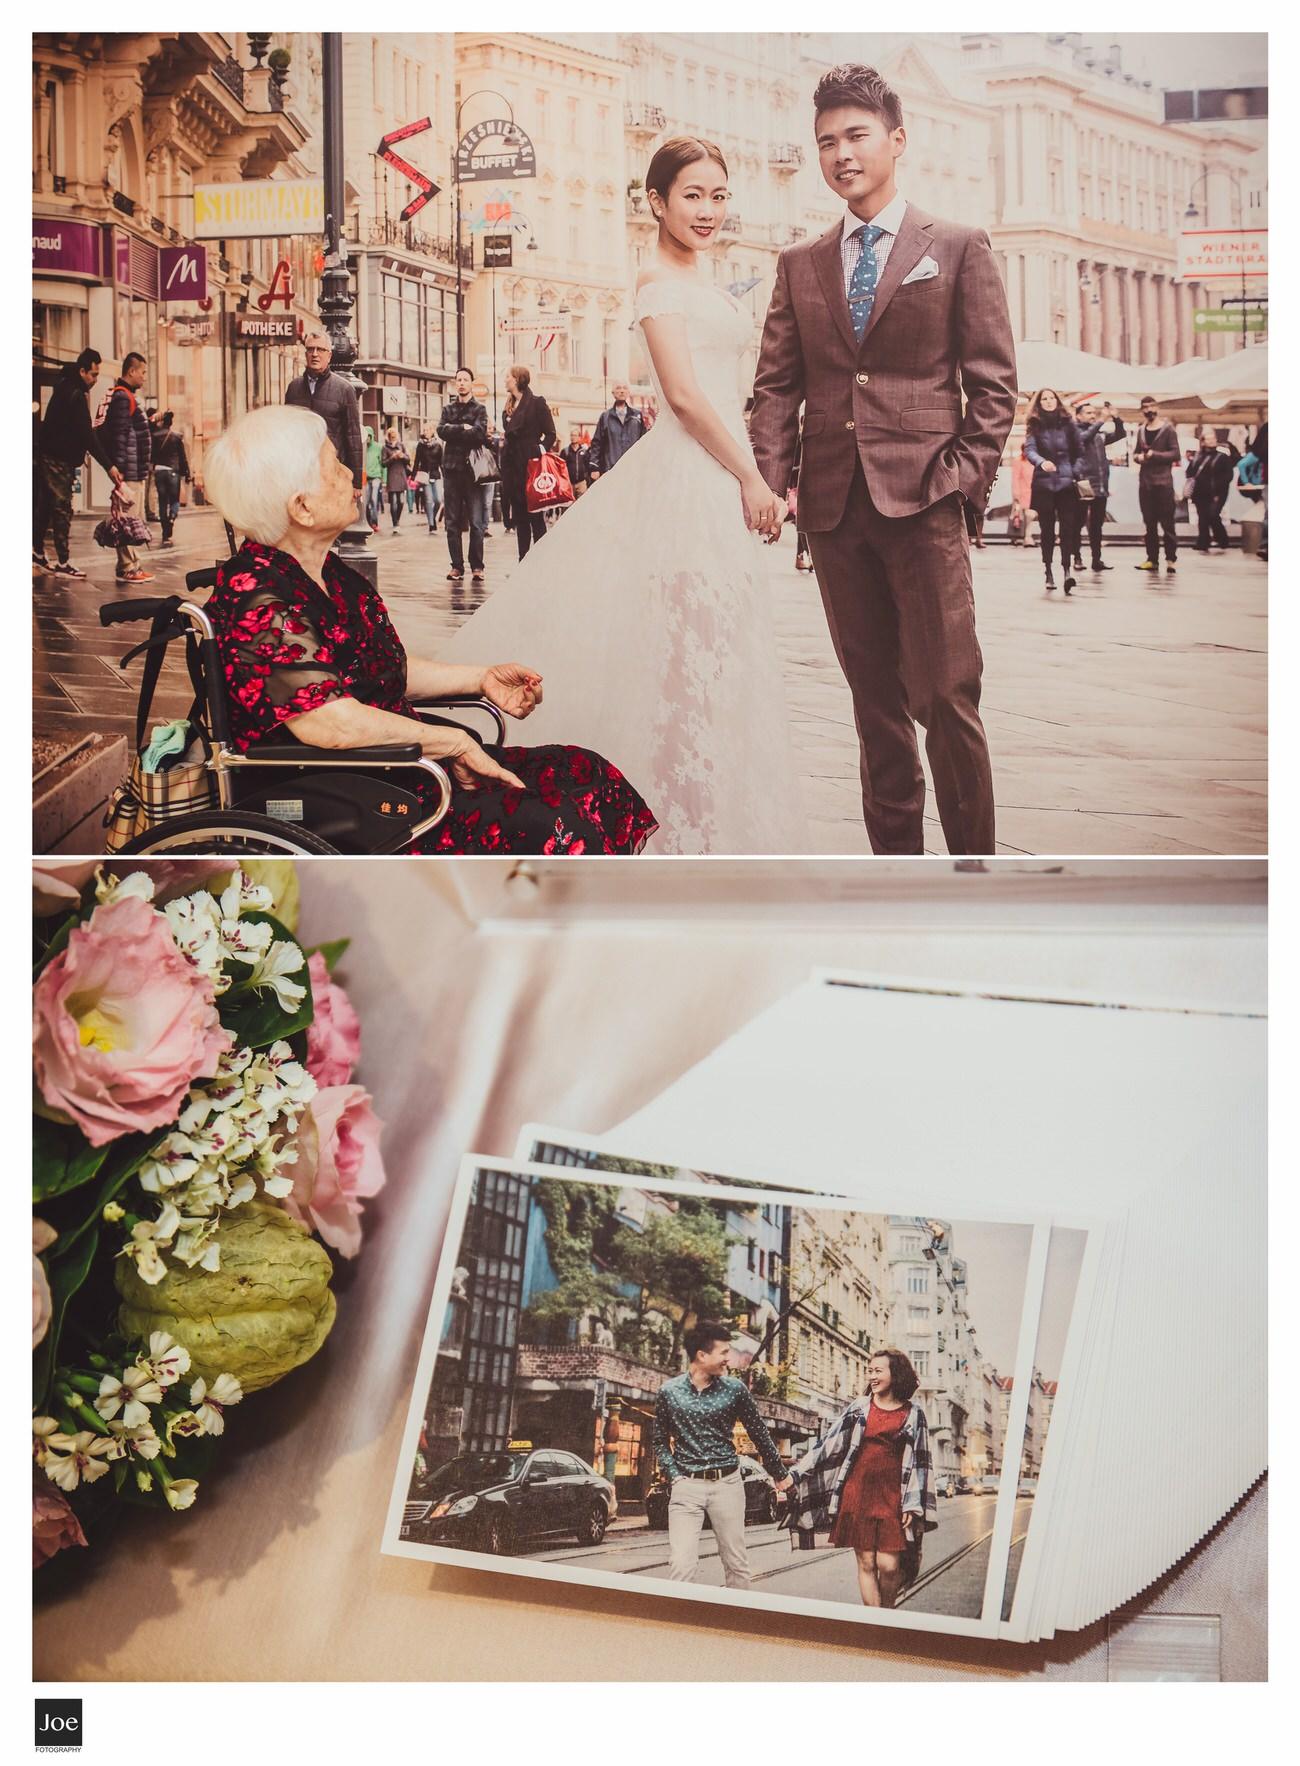 sunworld-dynasty-hotel-taipei-wedding-photo-joe-fotography-angel-jay-060.jpg